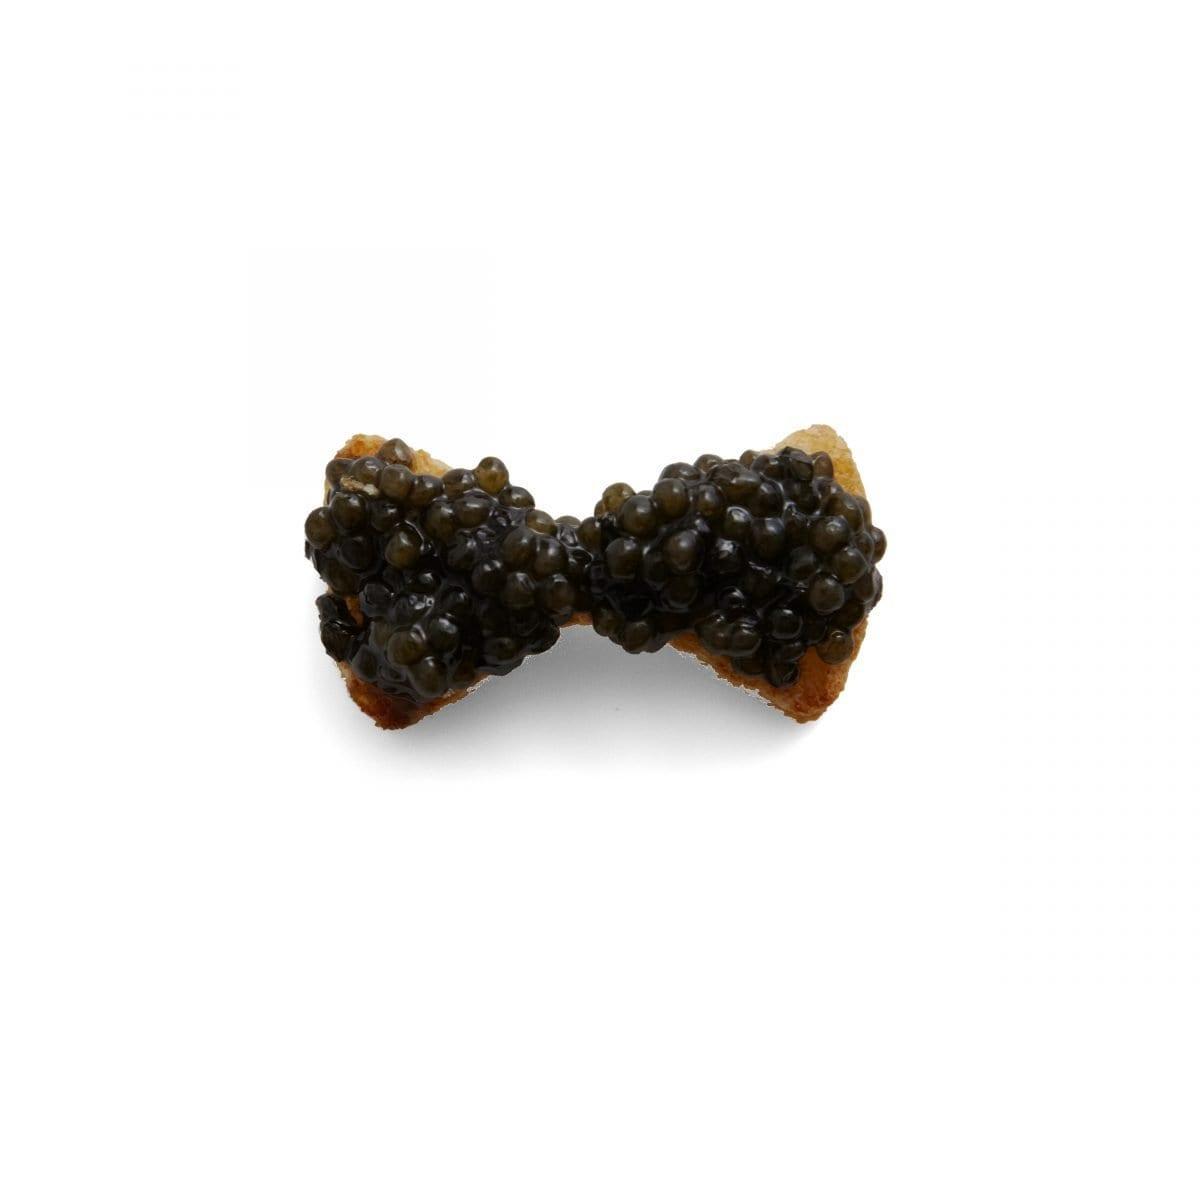 food-caviar-bowties-185